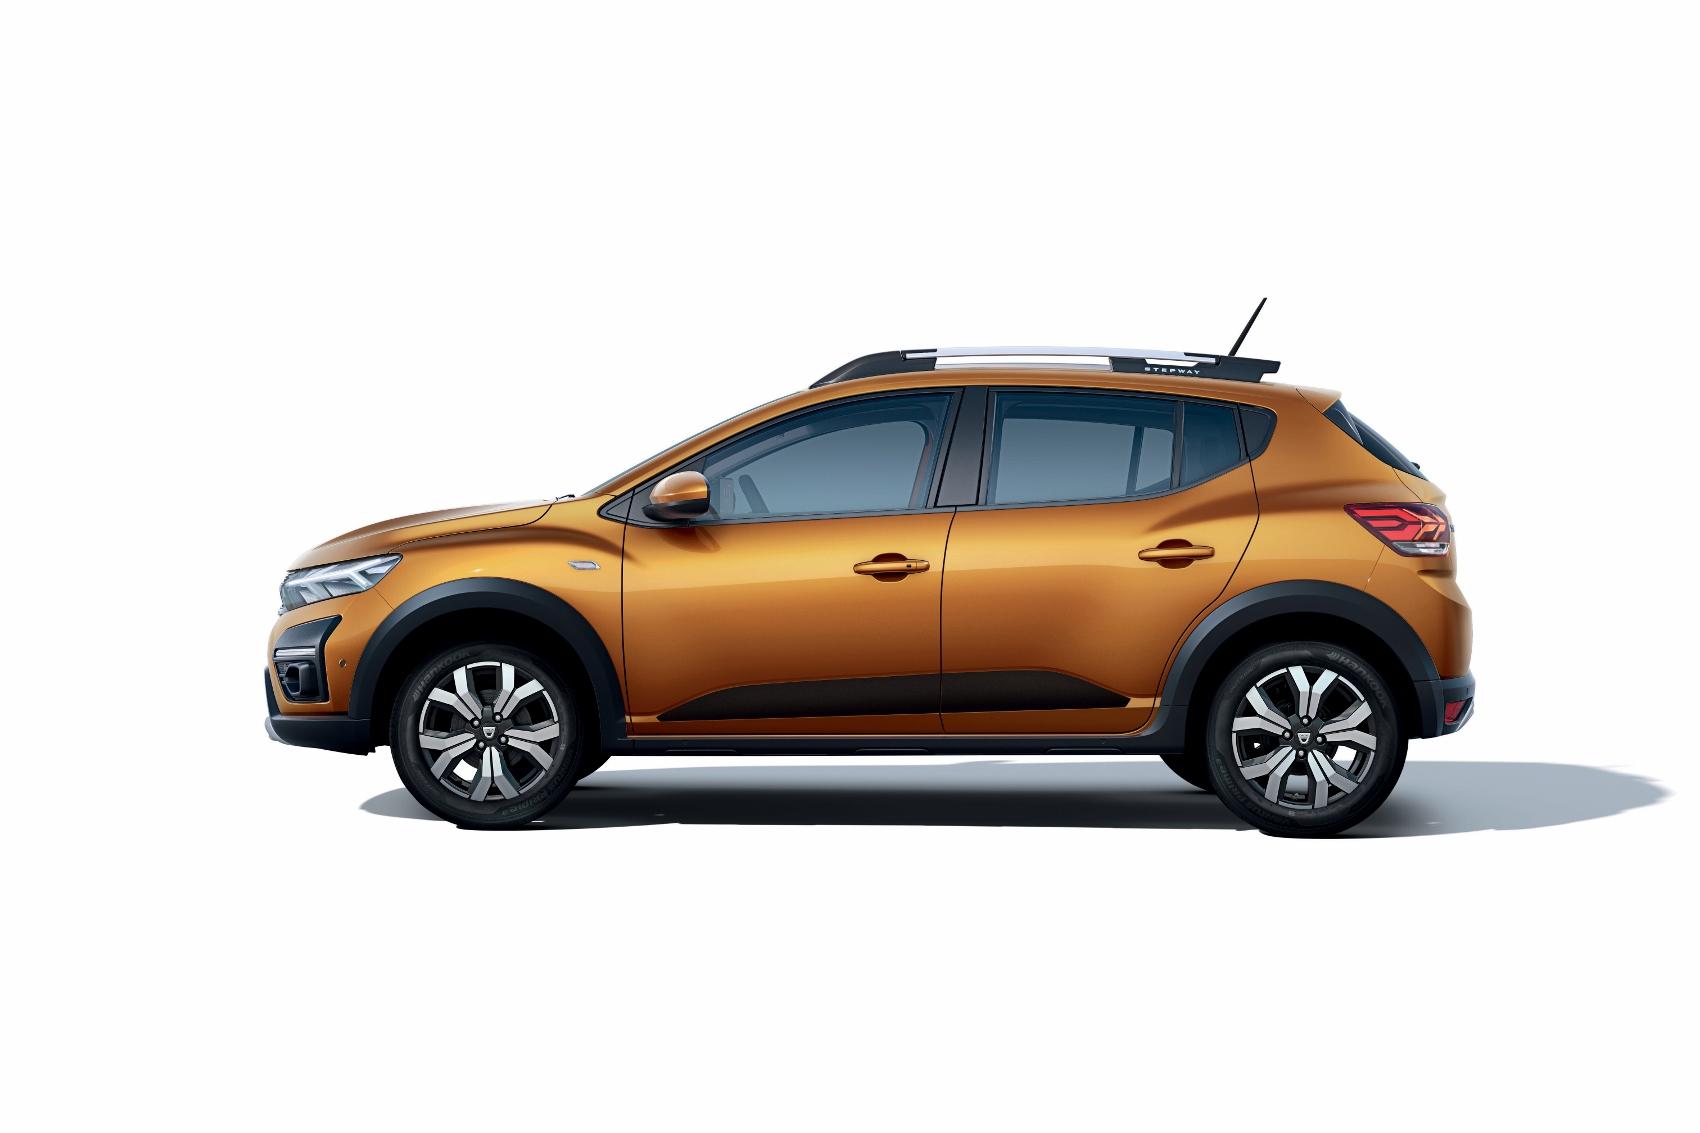 2020 - New Dacia SANDERO STEPWAY (4) (1700x1133)